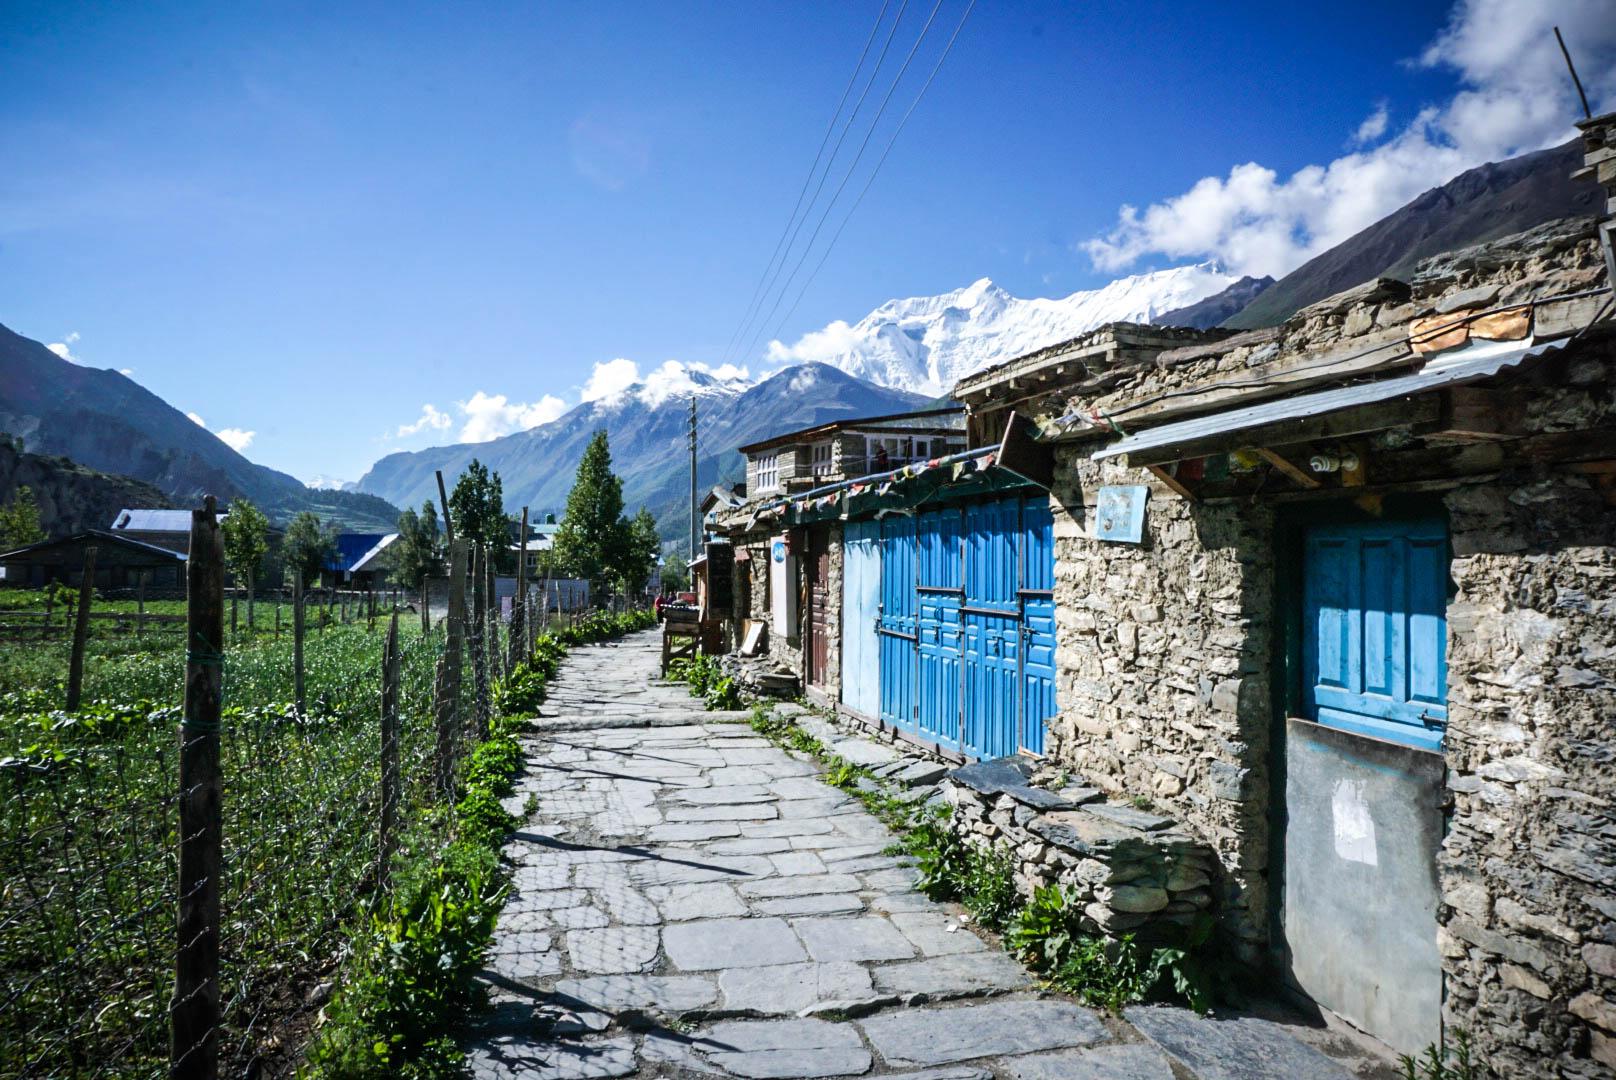 Manang, the Jewel of the Annapurna Circuit